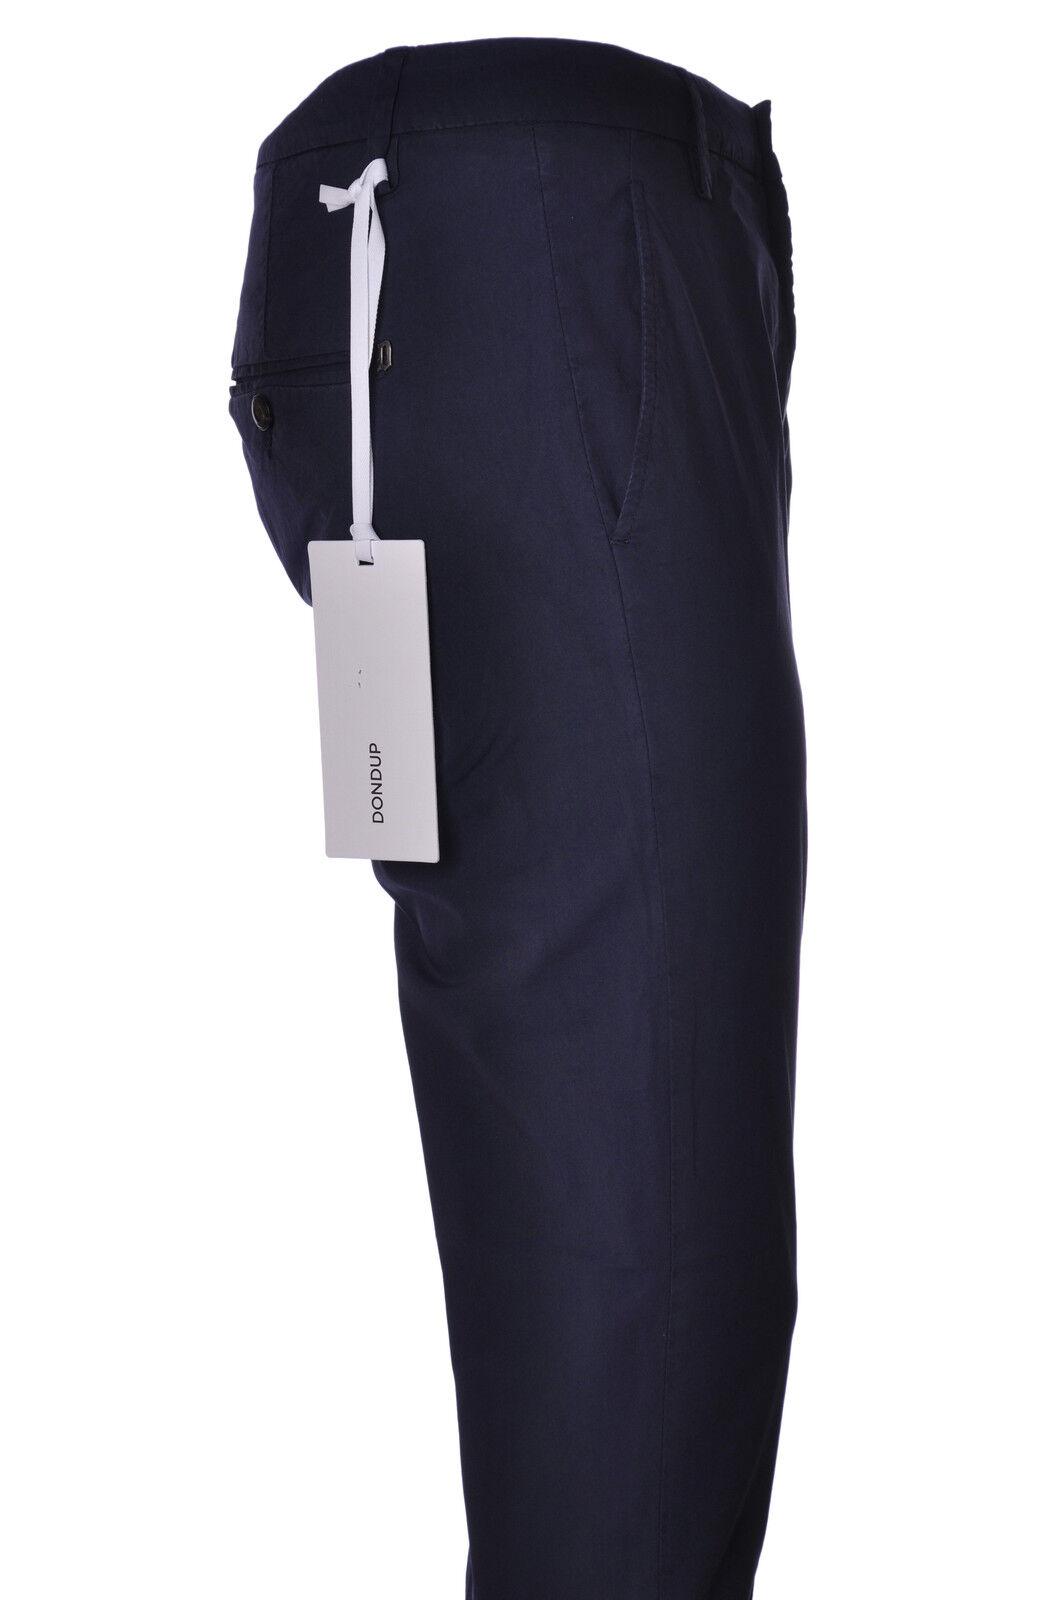 Dondup - Jeans-Pants - Man - bluee - 3079215G184020